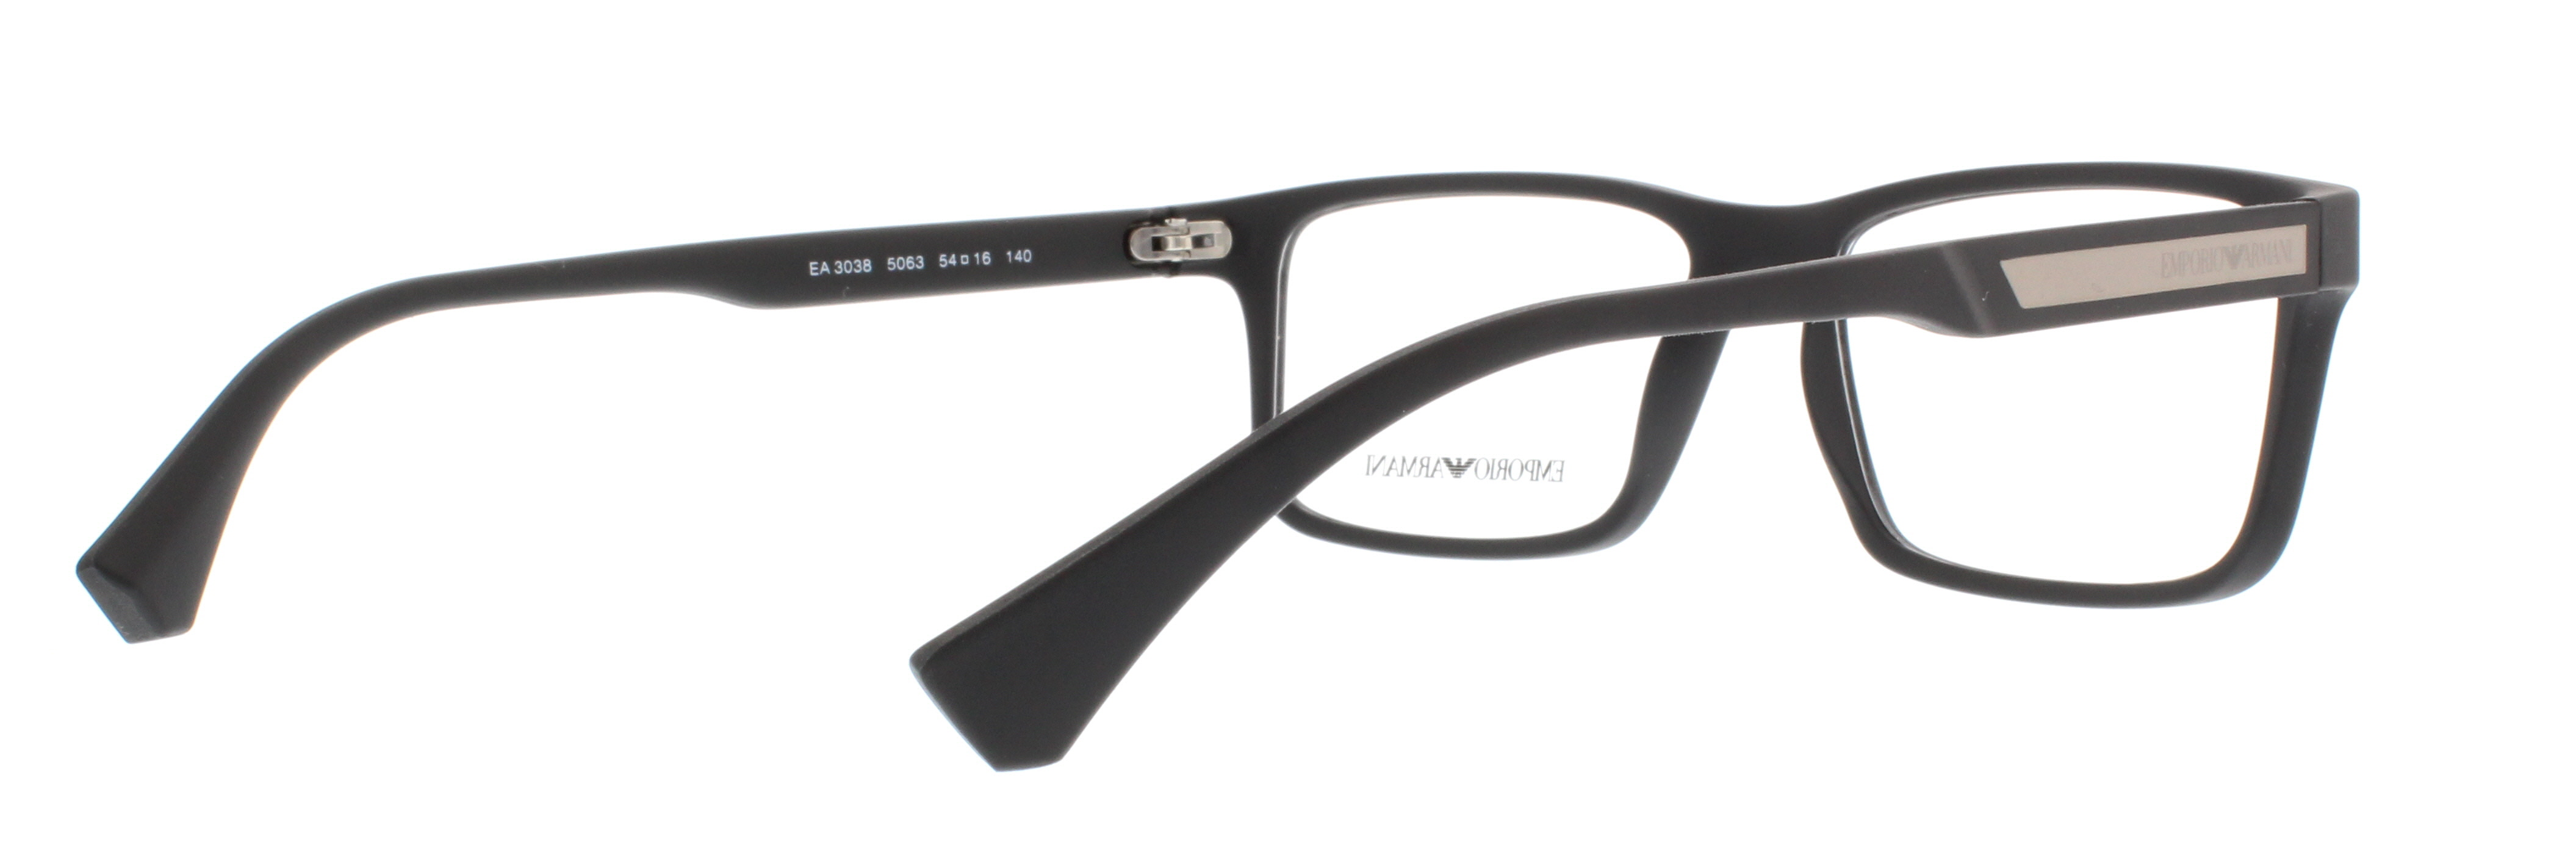 EMPORIO ARMANI Eyeglasses EA3038 5063 Black Rubber 54MM   eBay